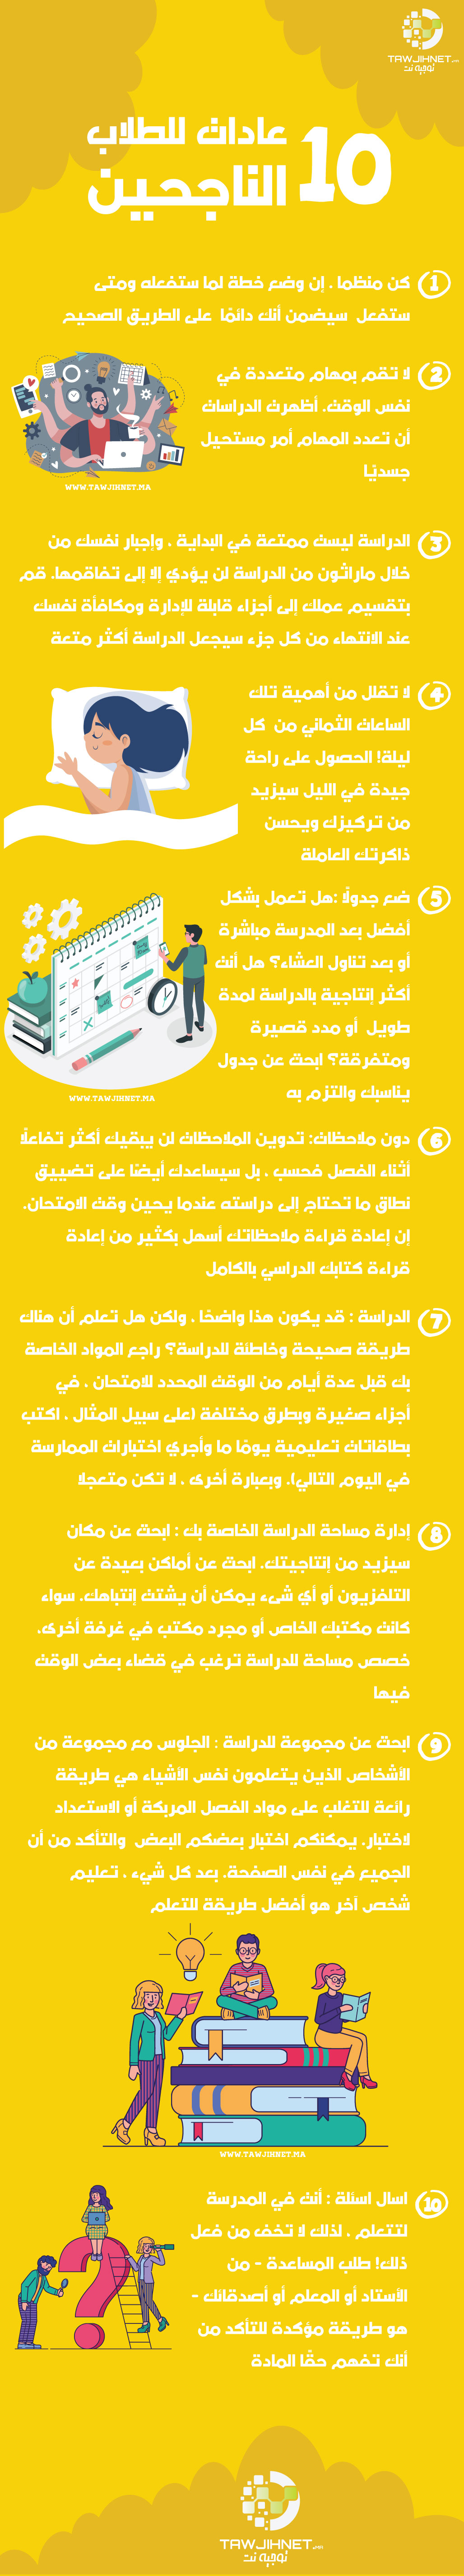 10 عادات للطلاب الناجحين createed by tawjihnet.ma